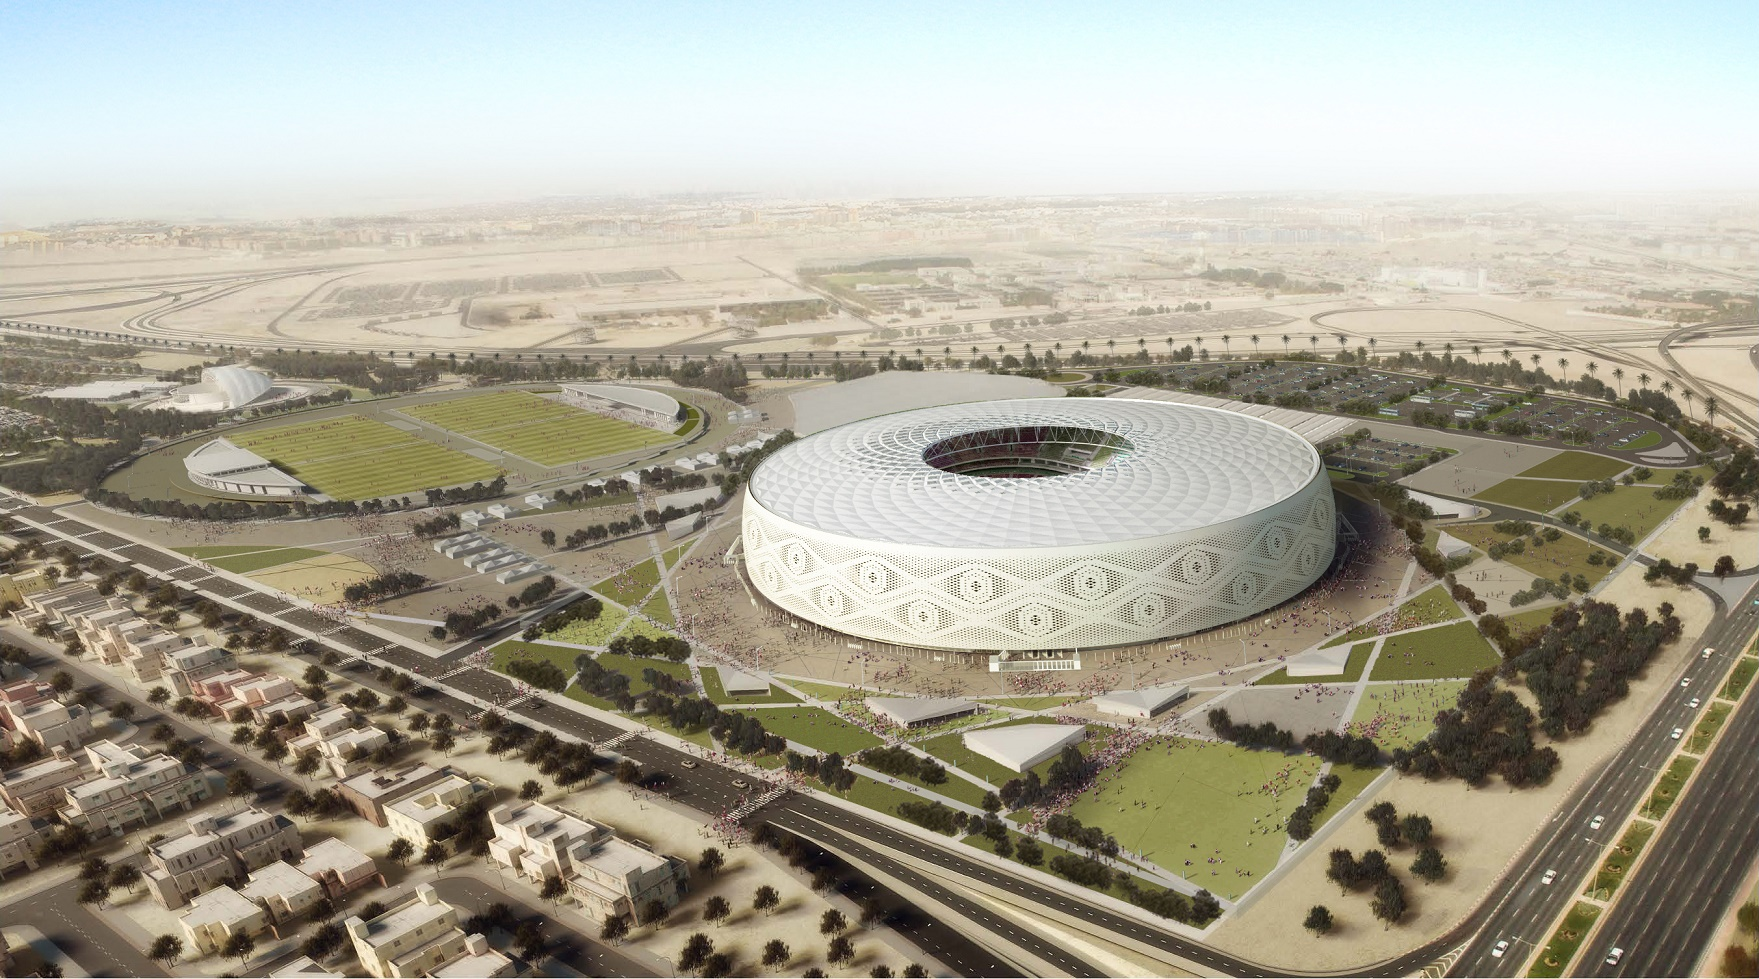 Al Thumama Stadium Qatar 2022